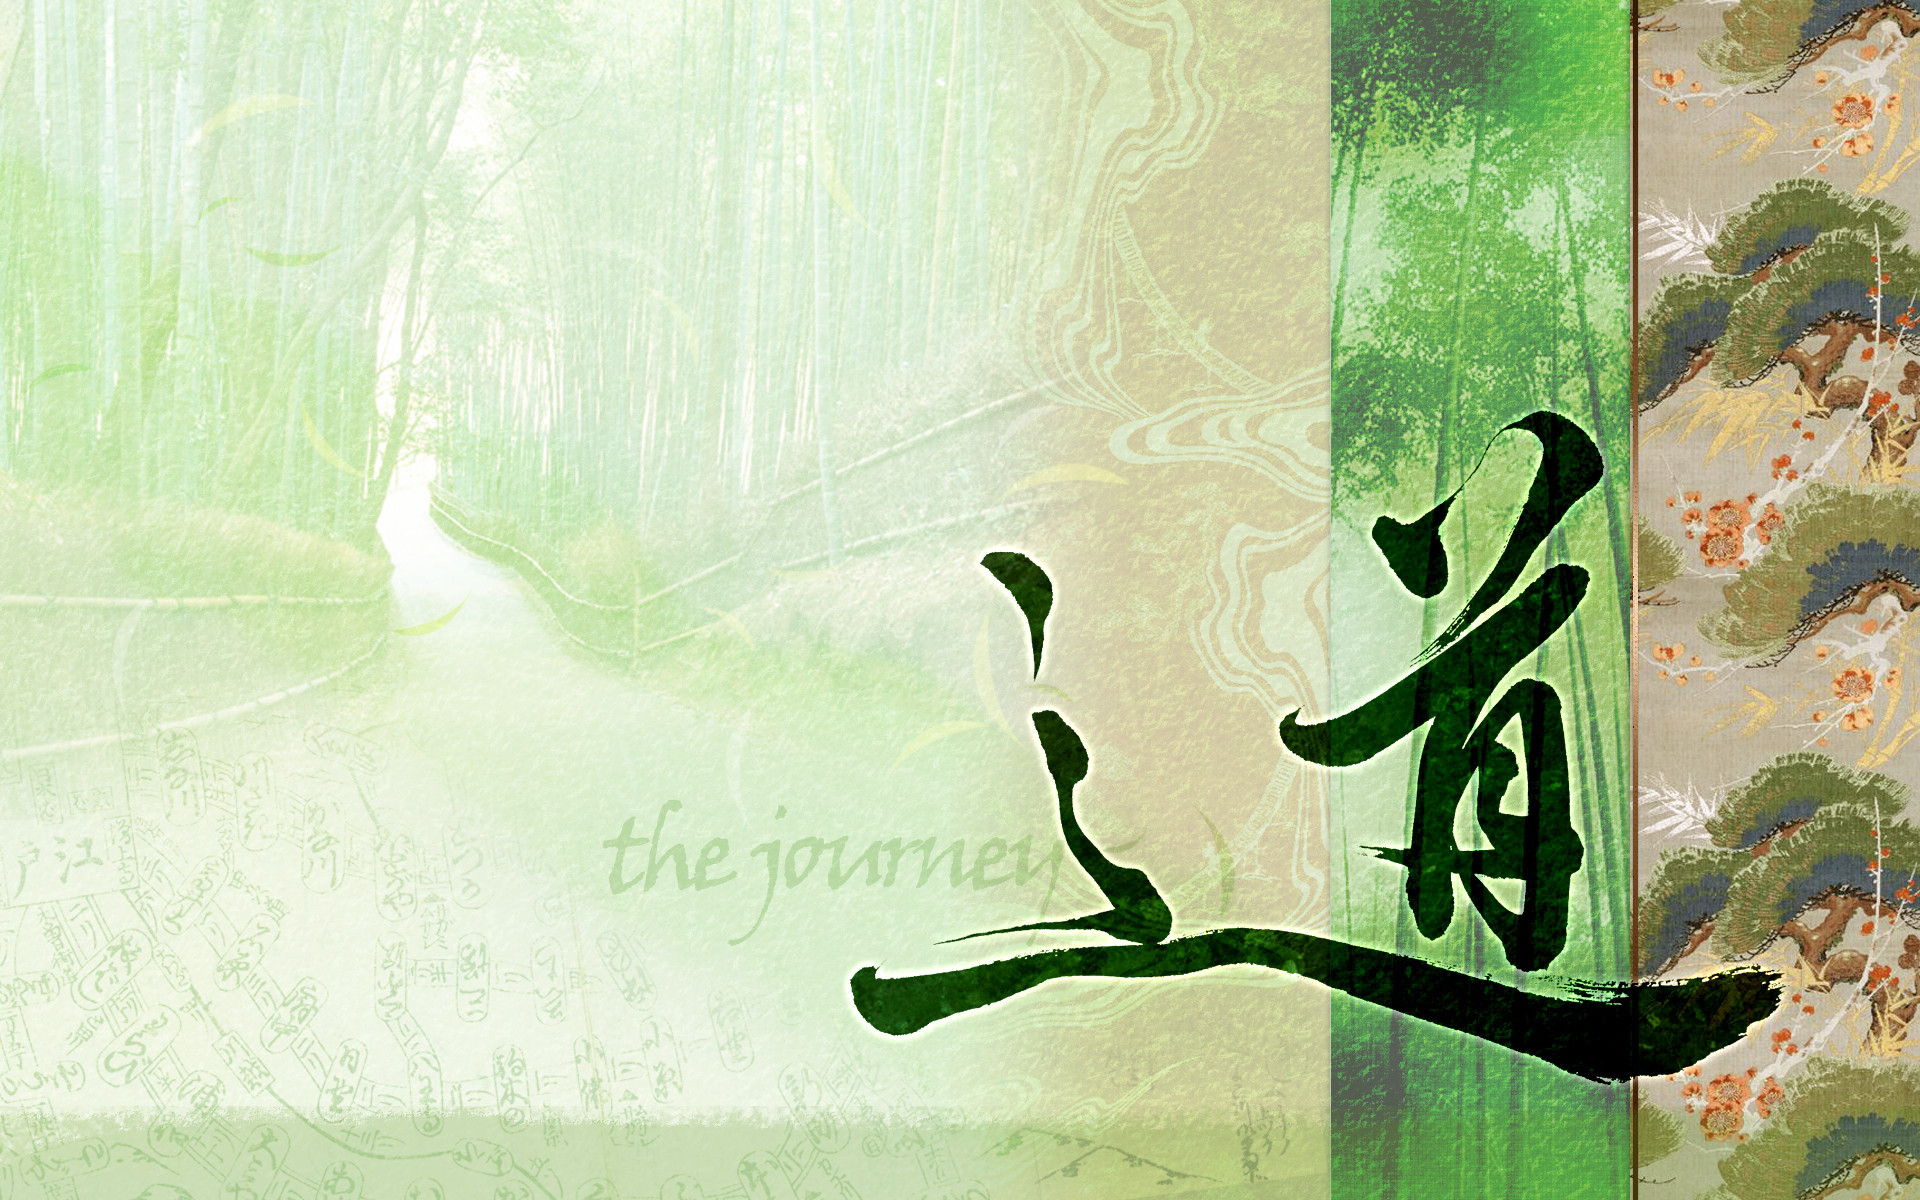 Wind Beautiful desktop backgrounds inspired by Japanese Kanji